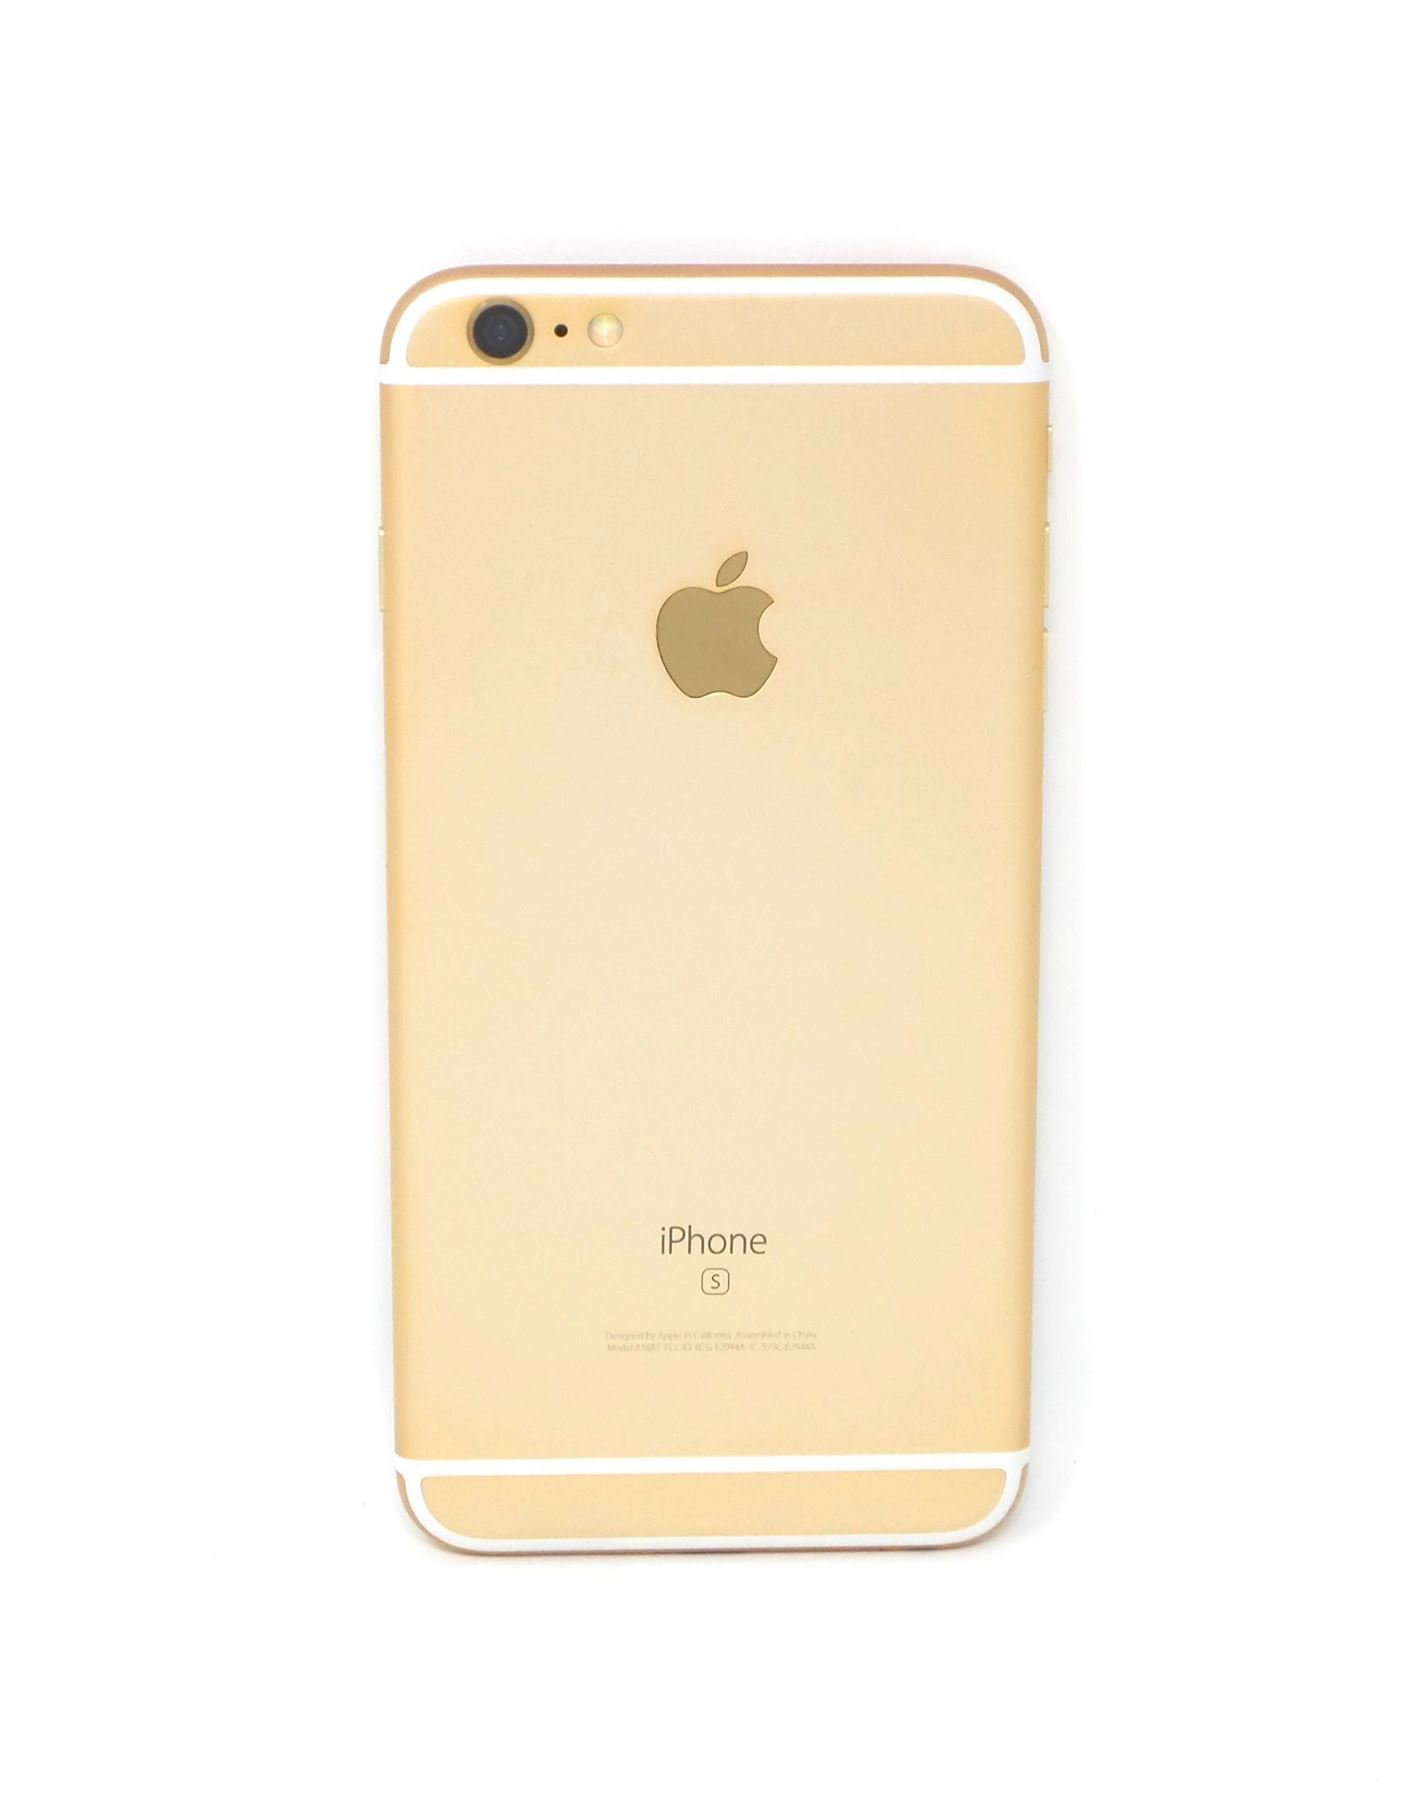 Apple-iPhone-6S-Plus-Carrier-Options-AT-amp-T-T-Mobile-Verizon-Unlocked-16-64-128GB thumbnail 8